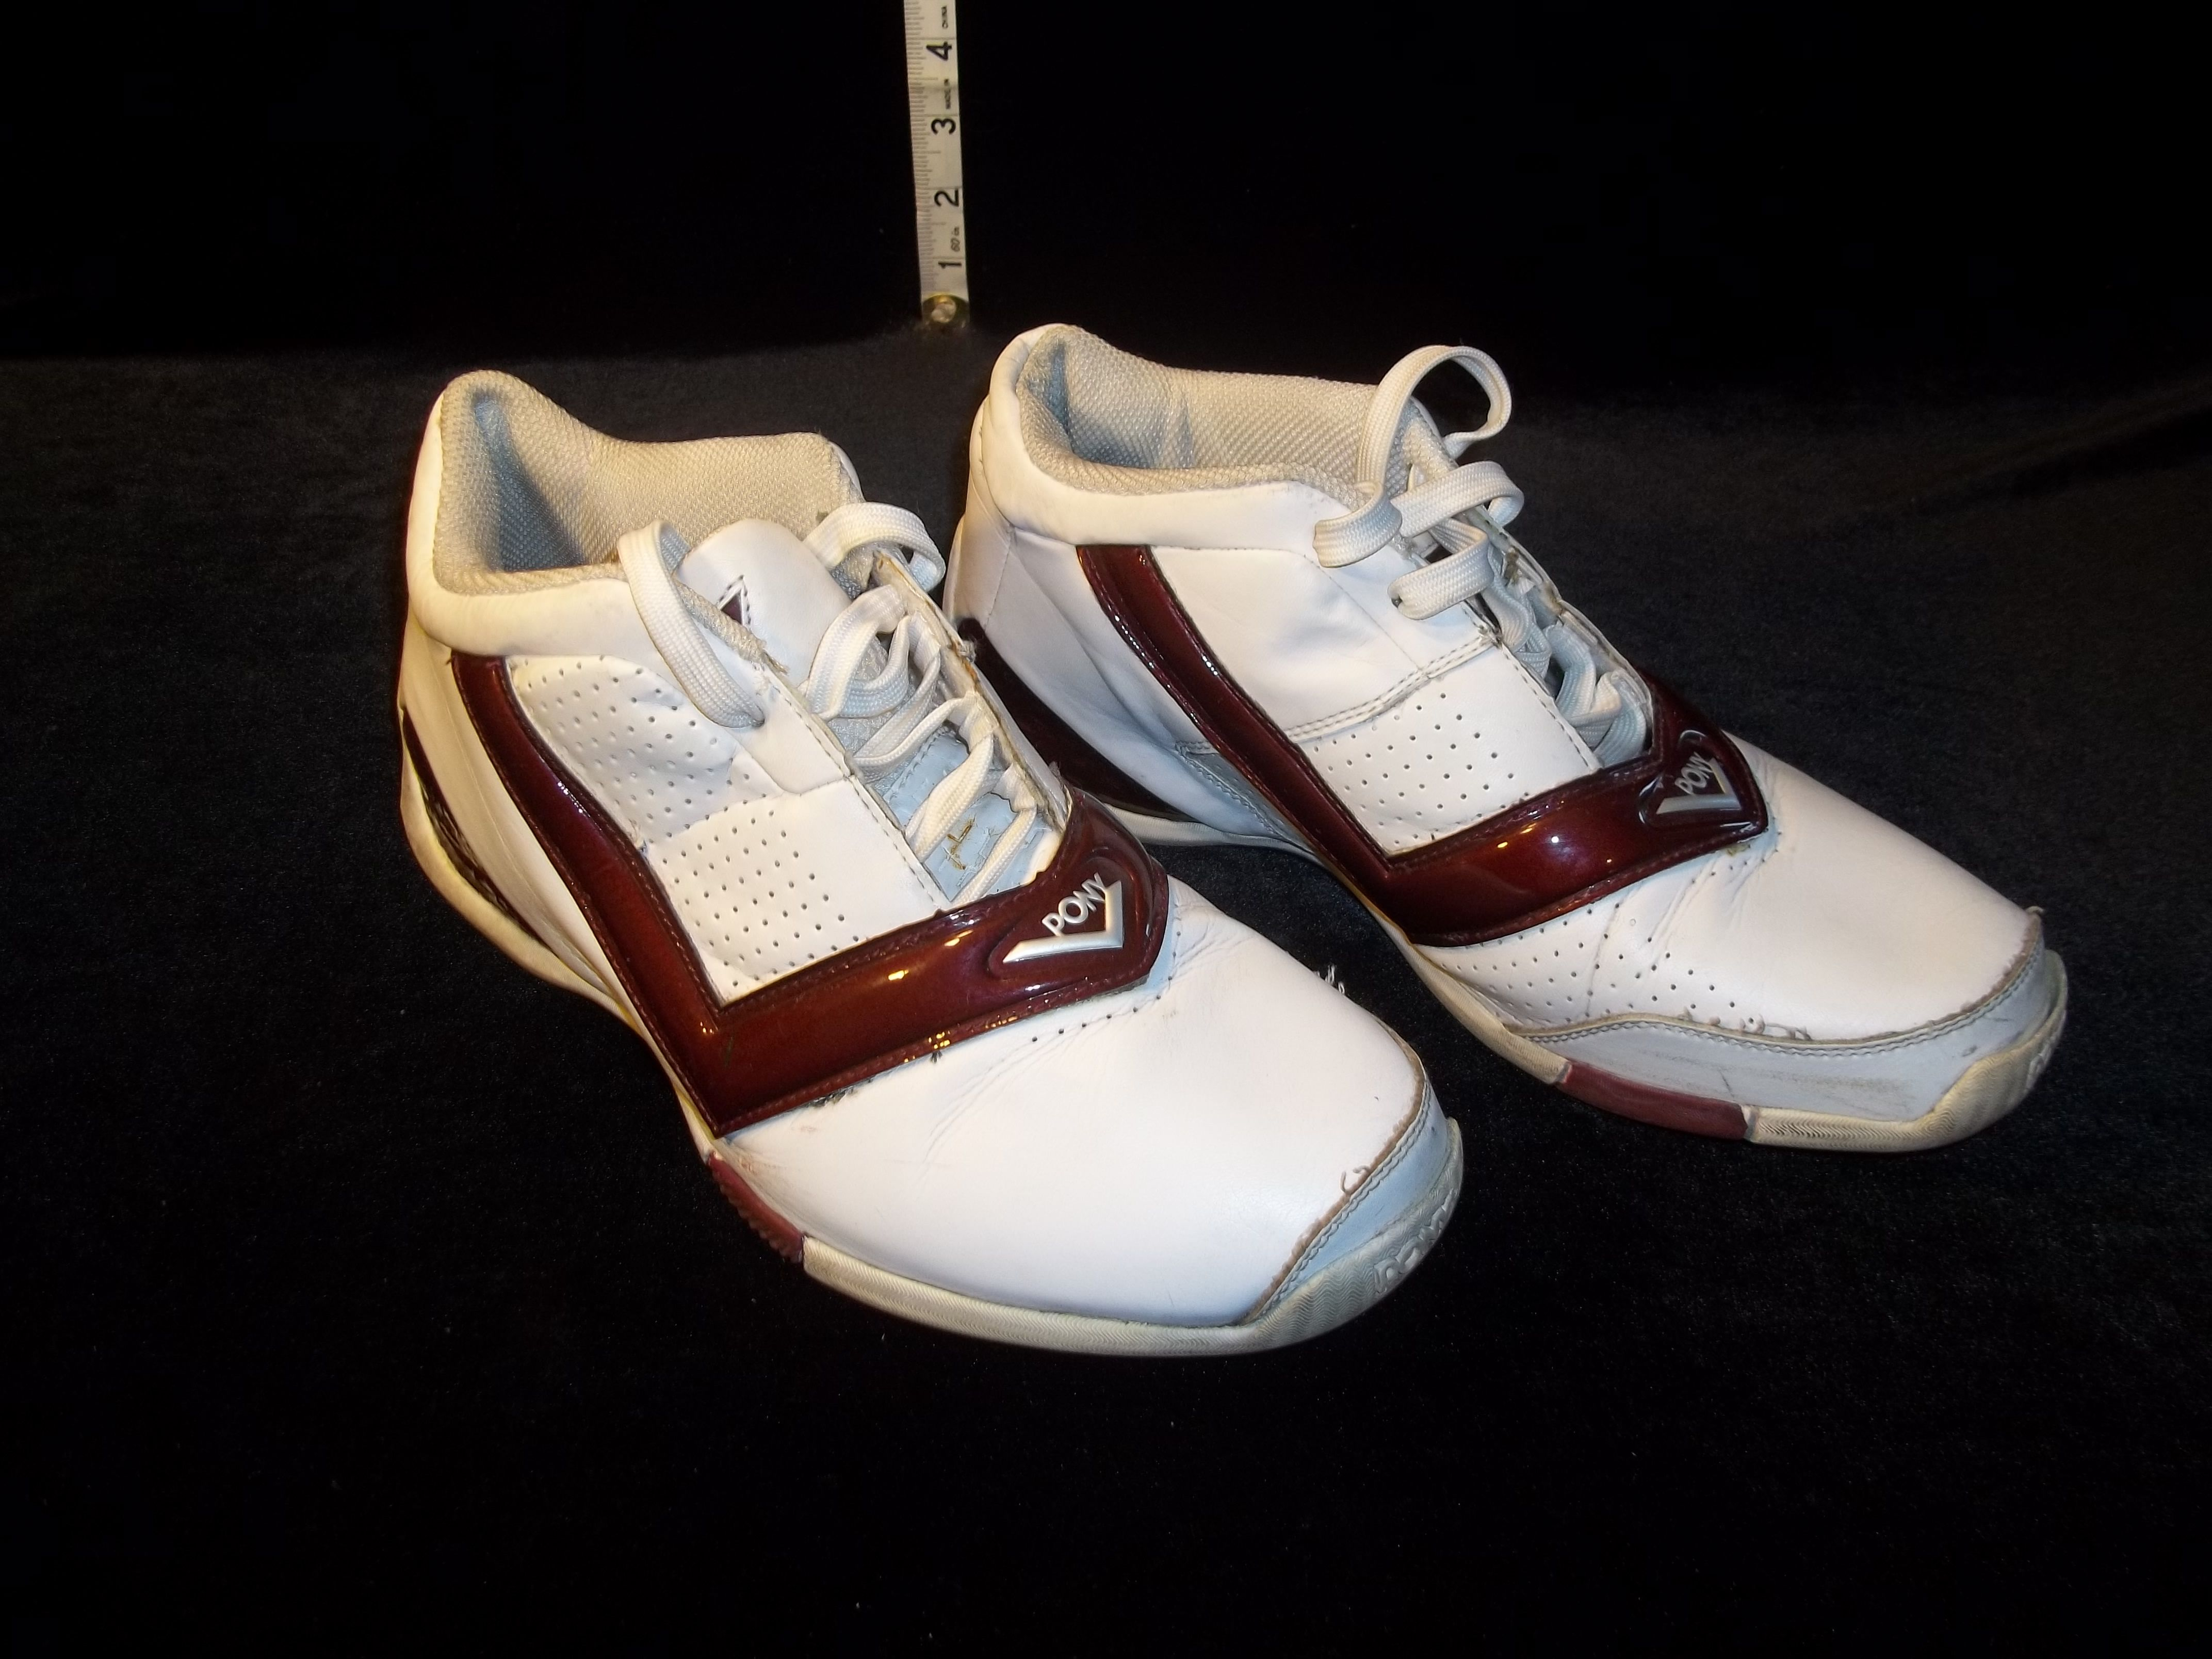 1993 charles barkley shoes christmas kd 6s